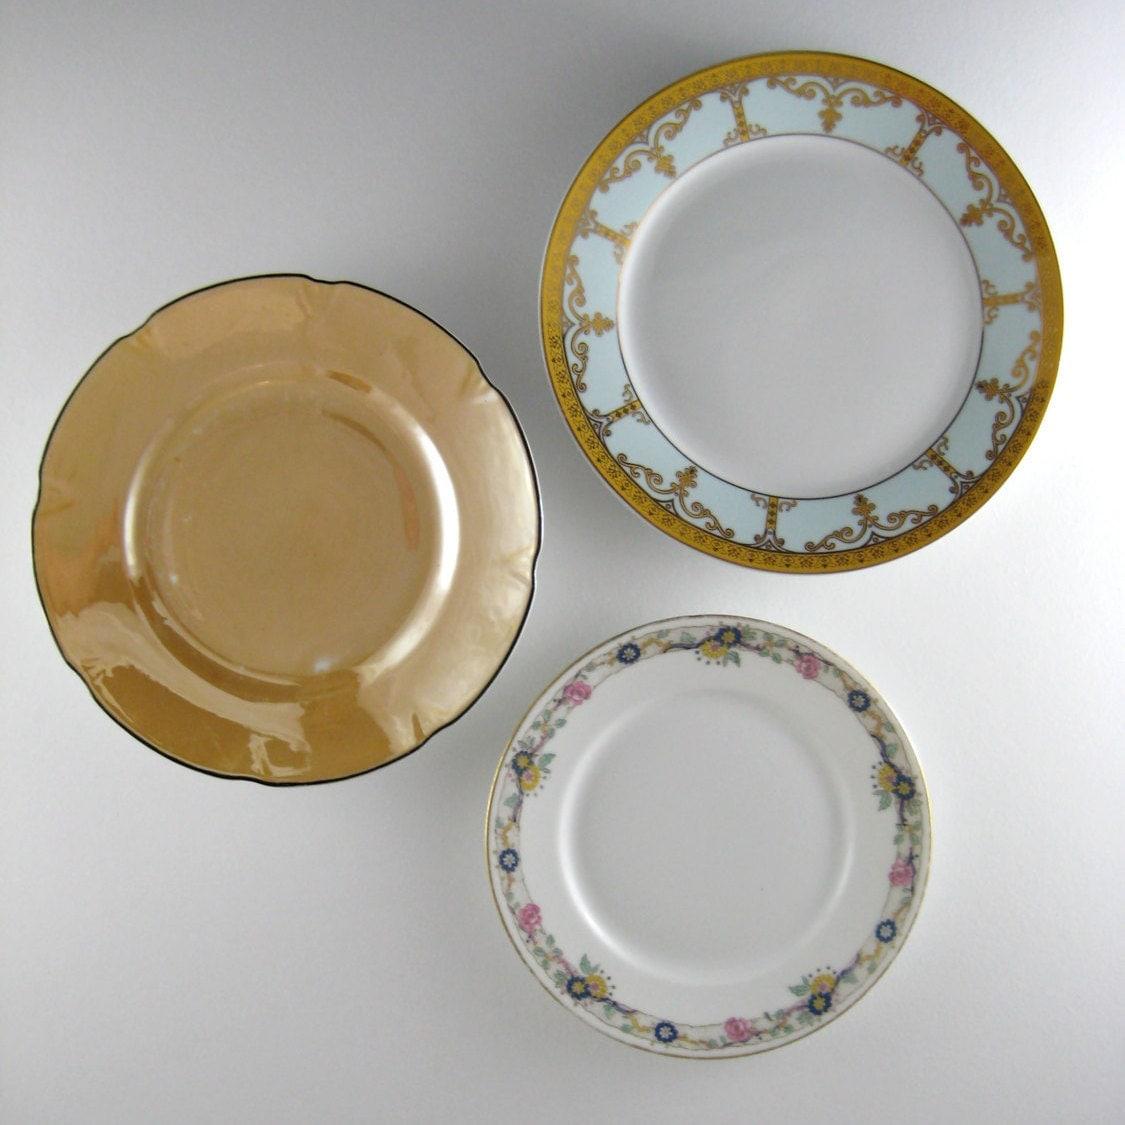 Decorative Wall Plates Kitchen : Vintage plates mismatched decorative kitchen